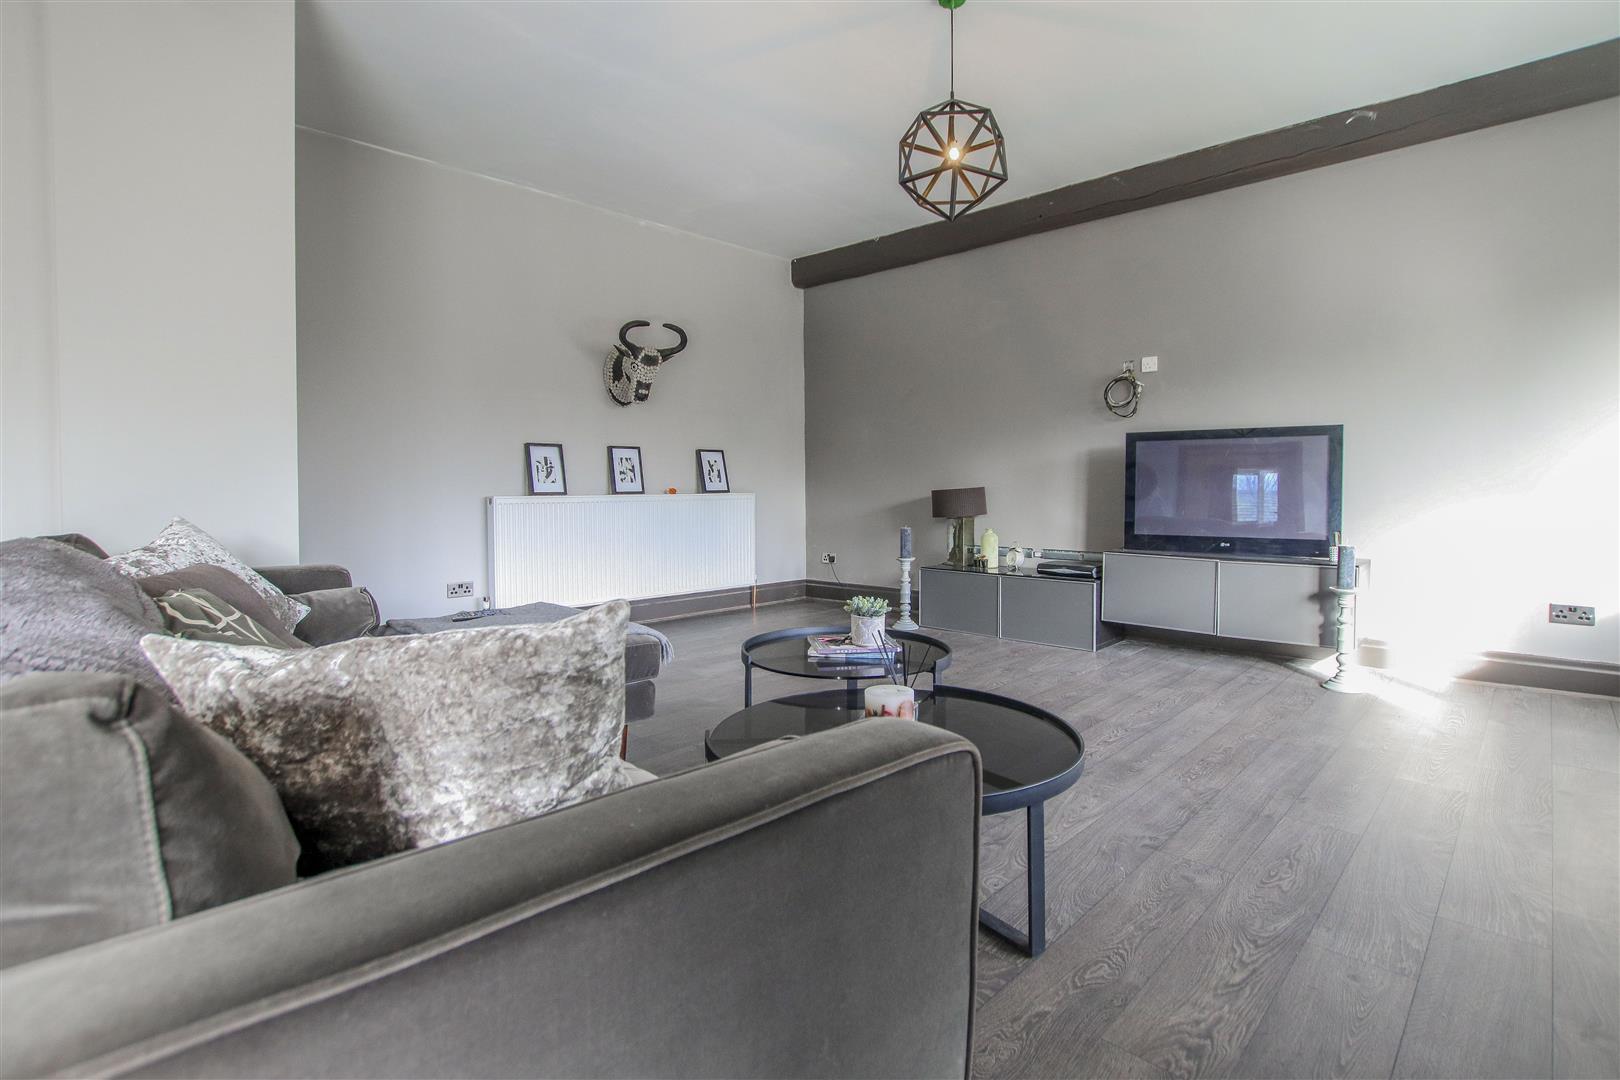 6 Bedroom Barn Conversion For Sale - 42.JPG